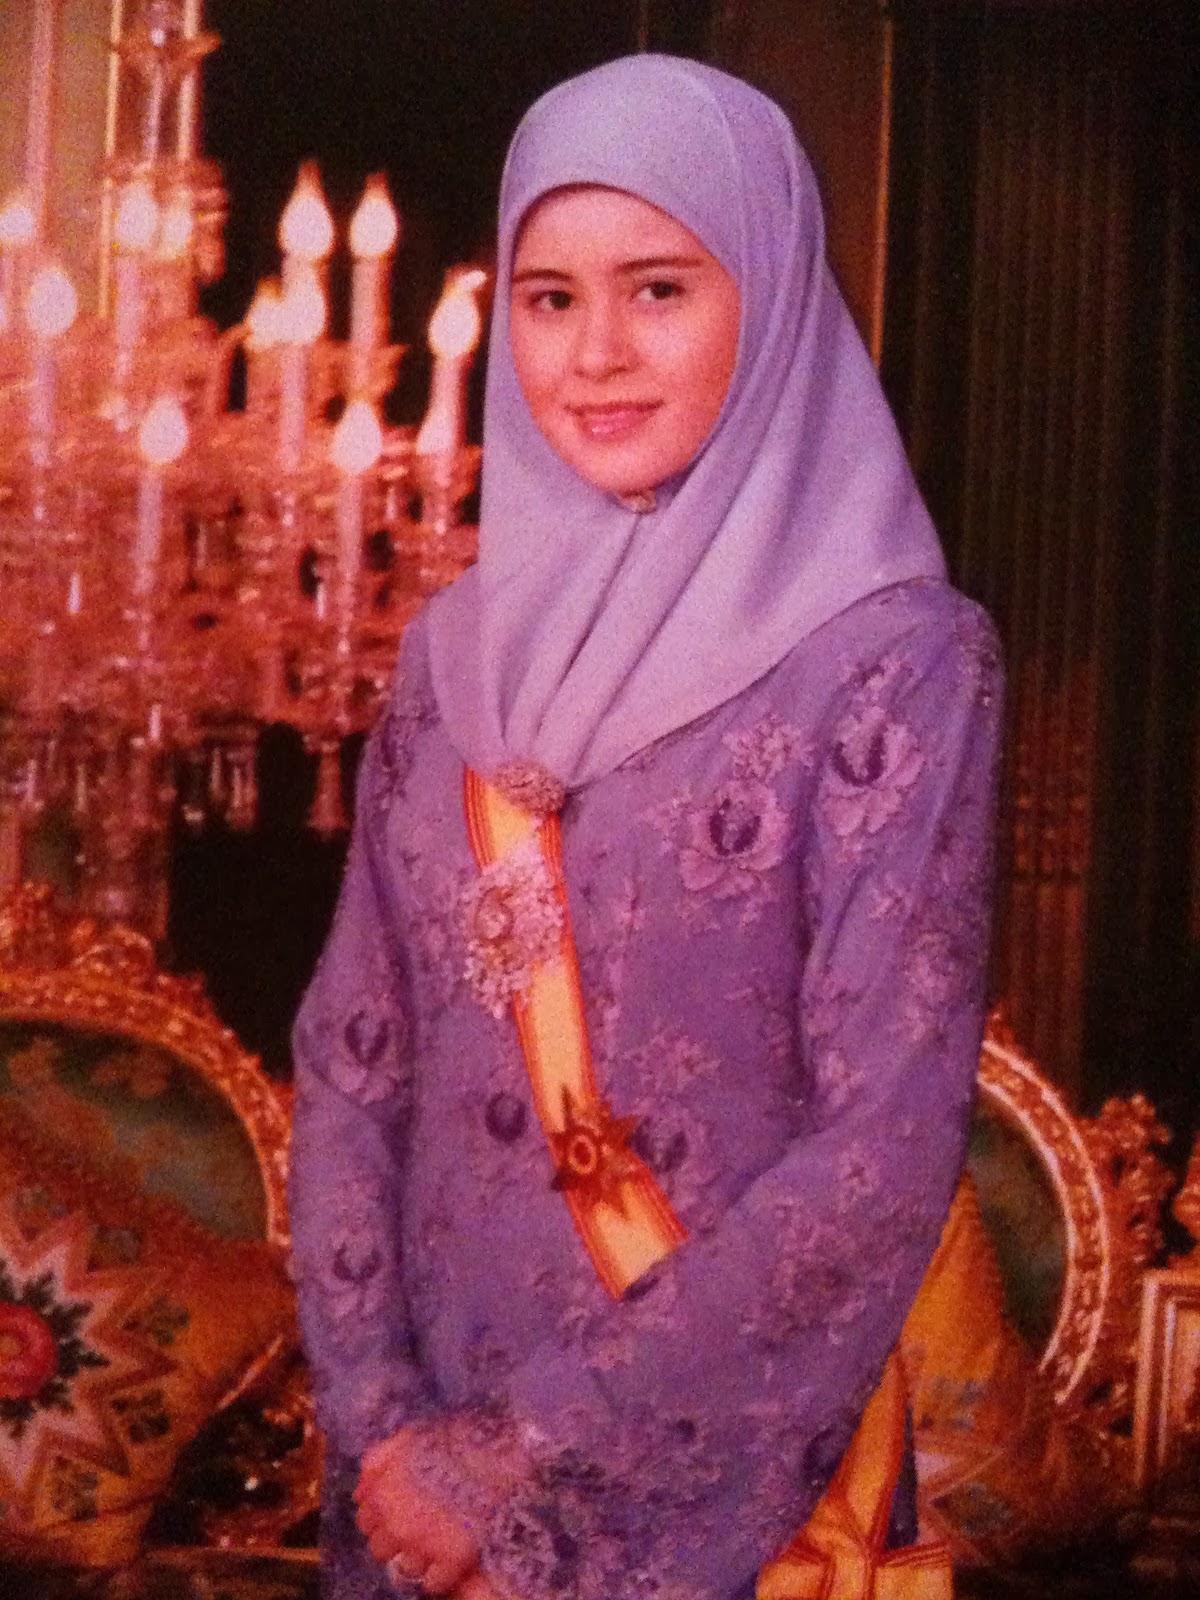 Pengiran Anak Sarah lambang Wanita Moden Brunei